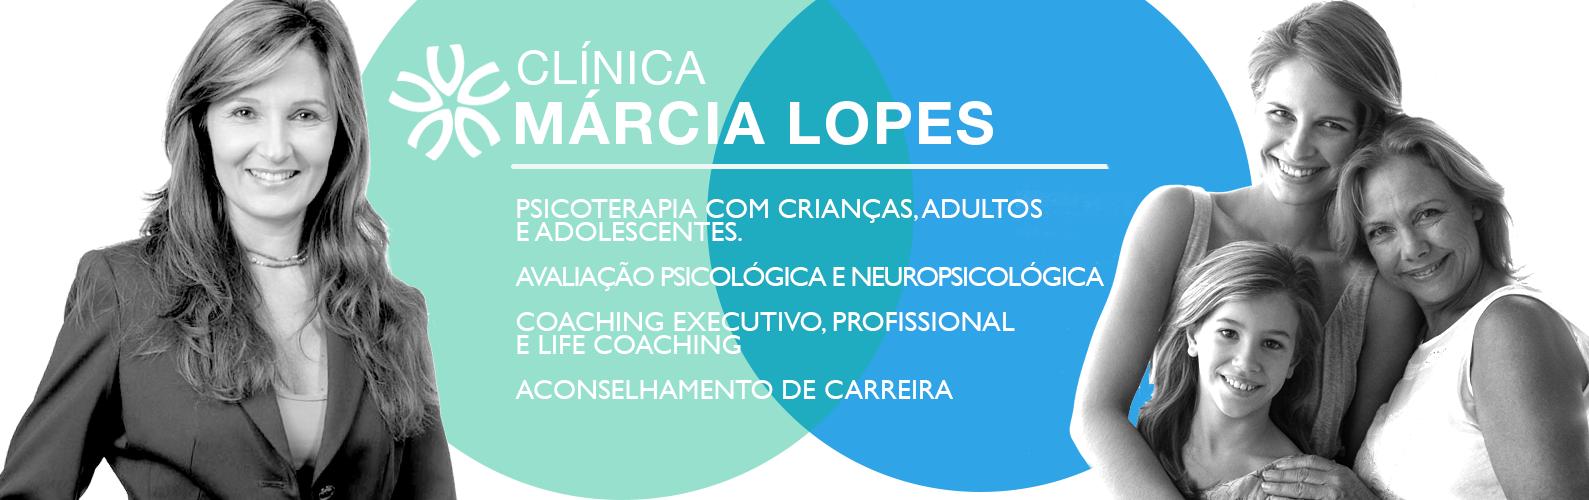 Clínica Márcia Lopes